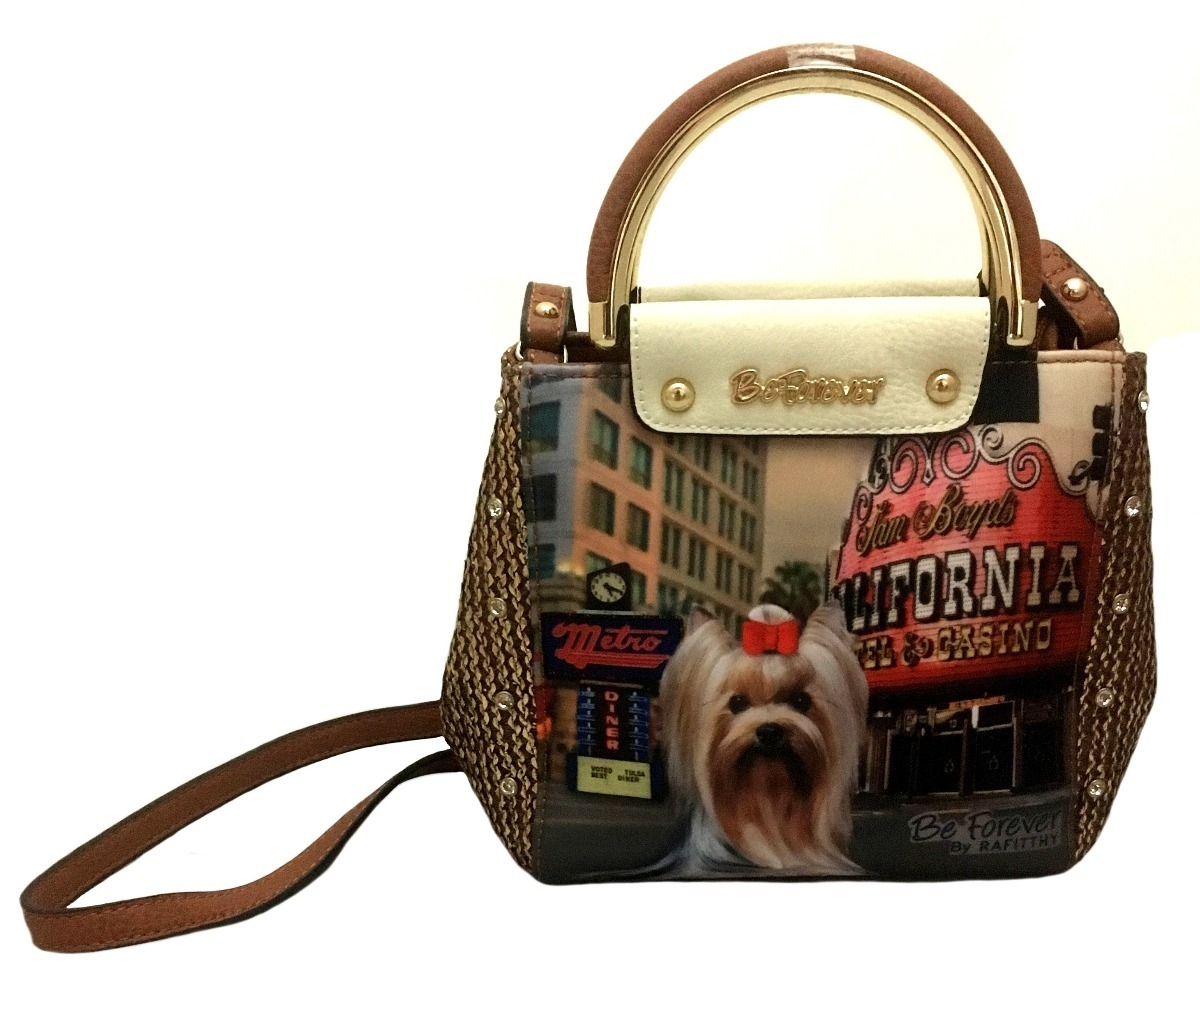 c876ae890 bolsa feminina pequena york casino marrom original rafitthy. Carregando  zoom.